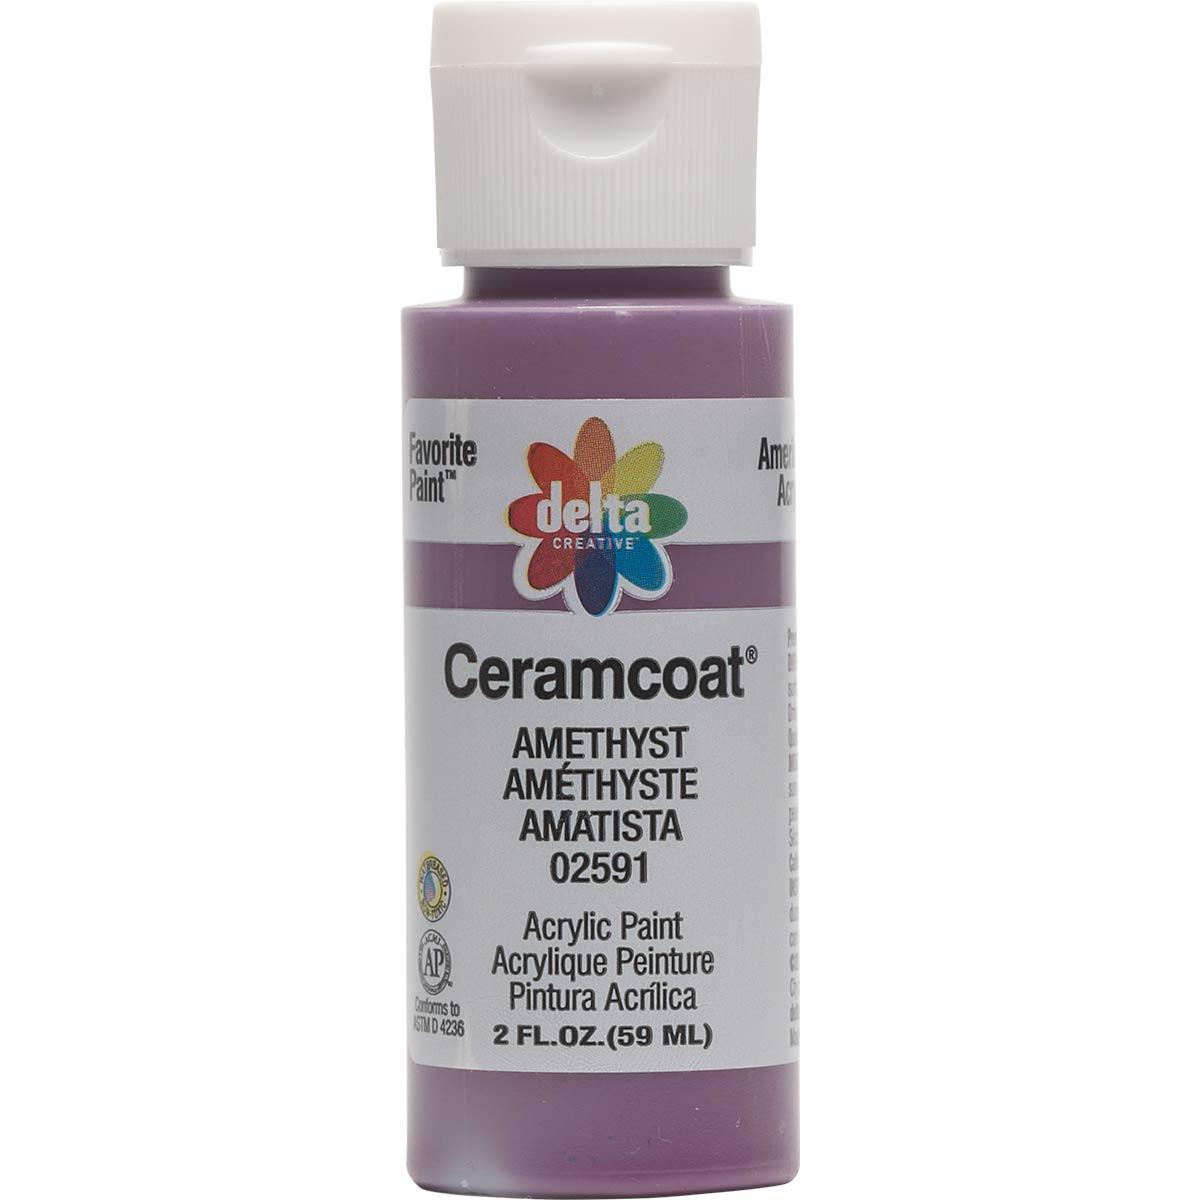 Delta Ceramcoat ® Acrylic Paint - Amethyst, 2 oz. - 025910202W